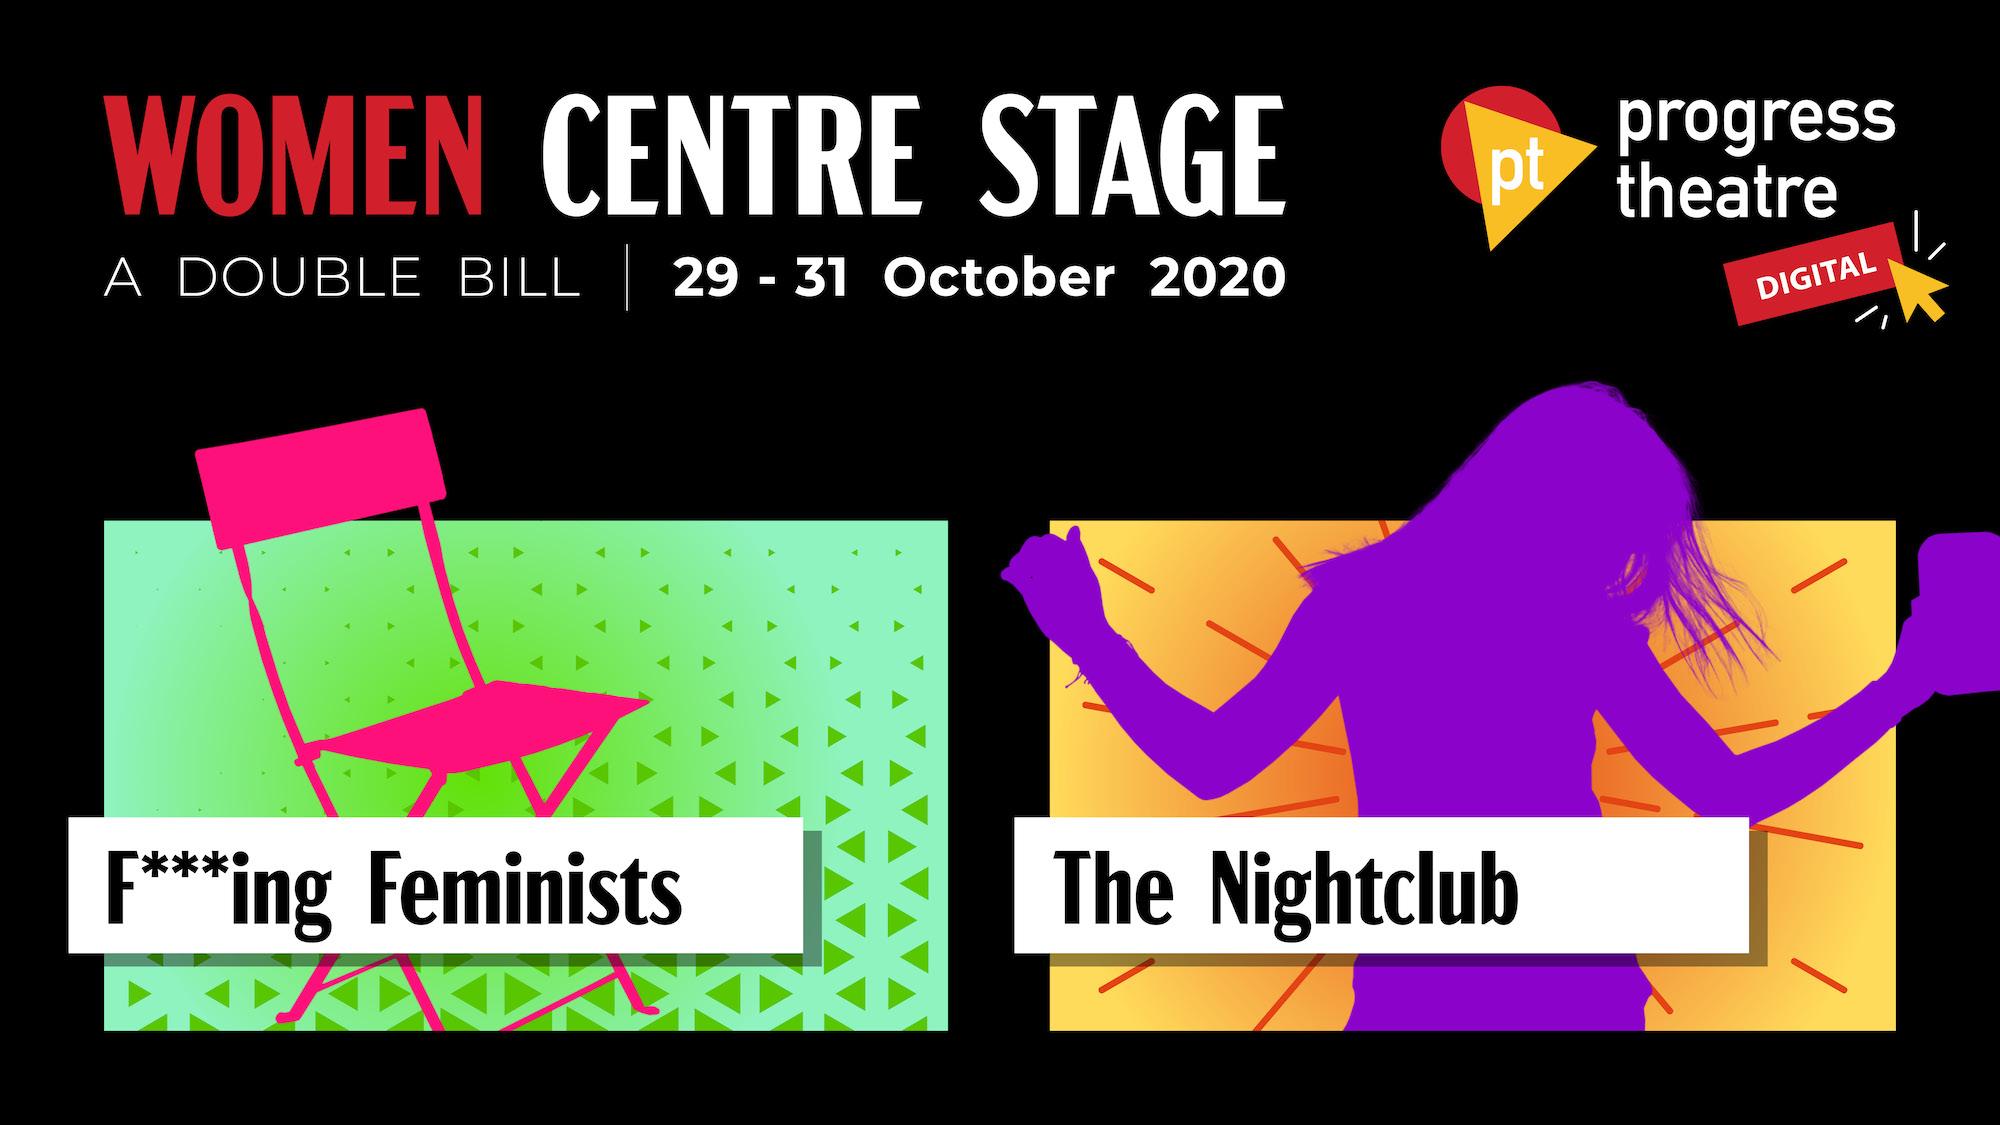 Women Centre stage graphic